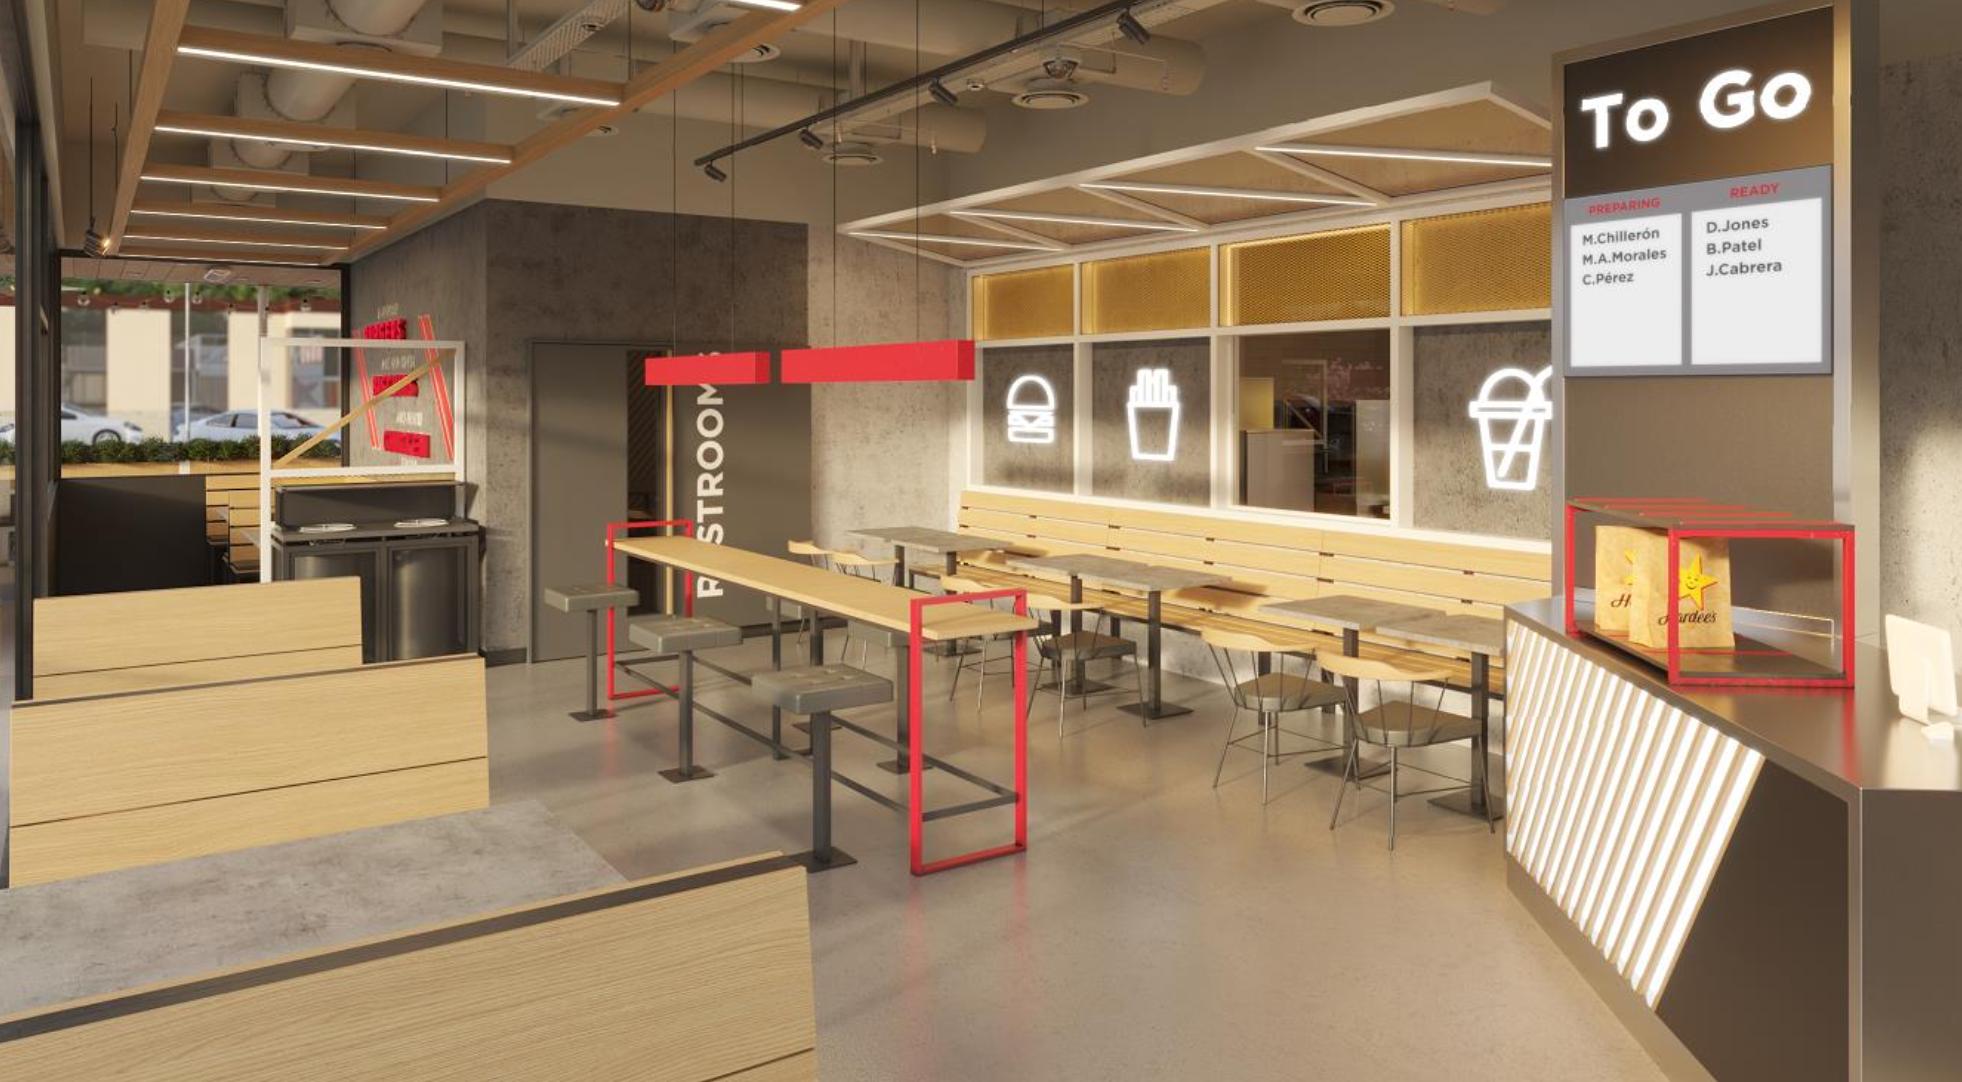 CKE Restaurant Concept